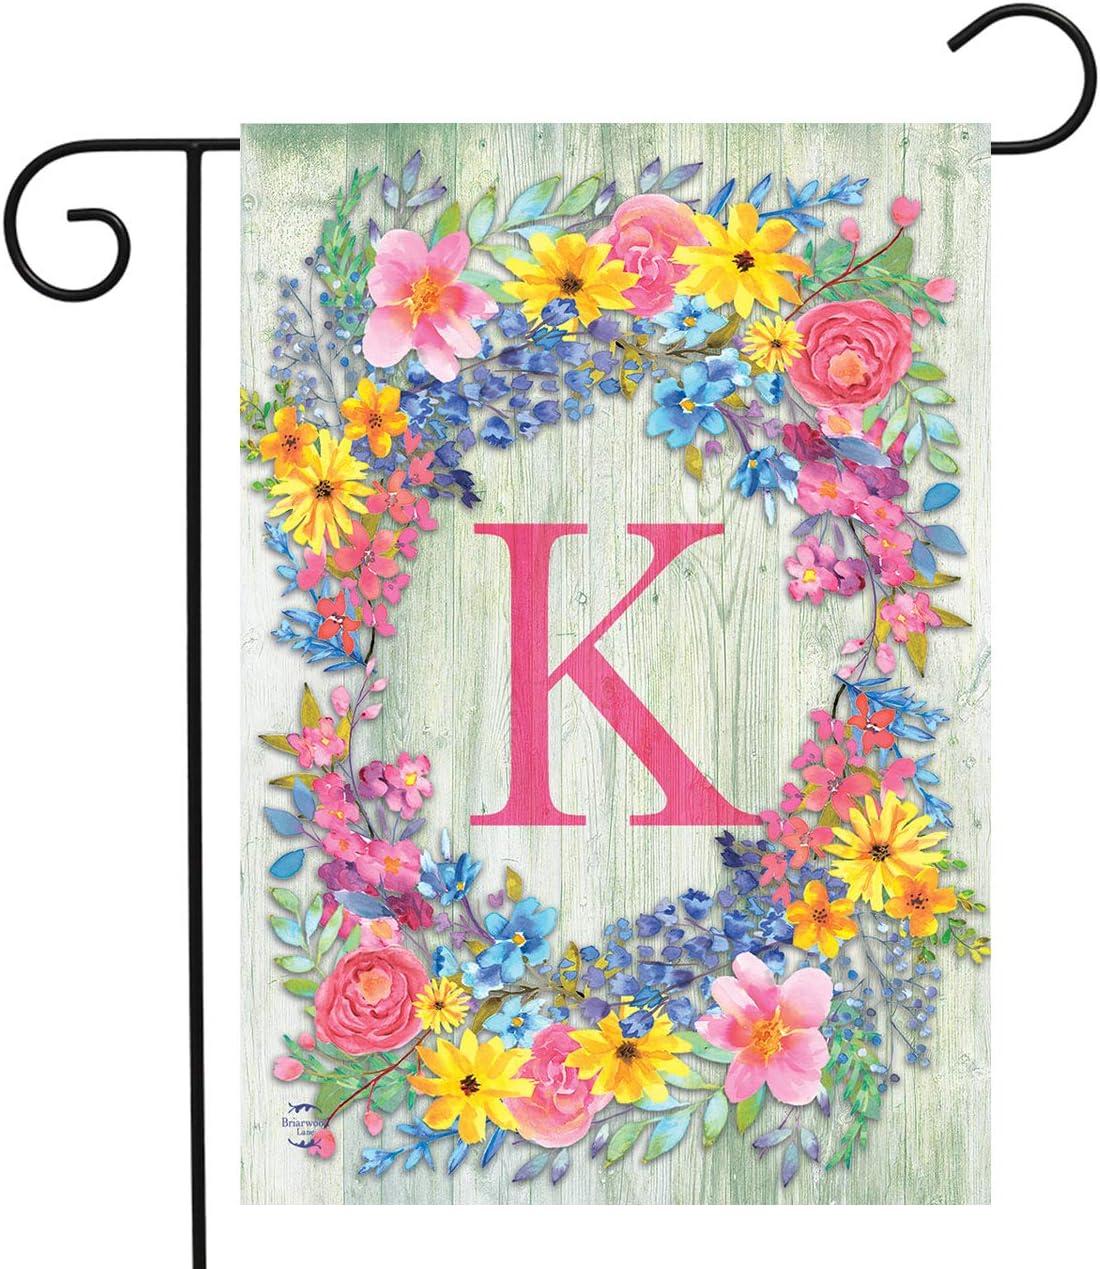 "Briarwood Lane Spring Monogram Letter K Garden Flag Floral Wreath 12.5"" x 18"""